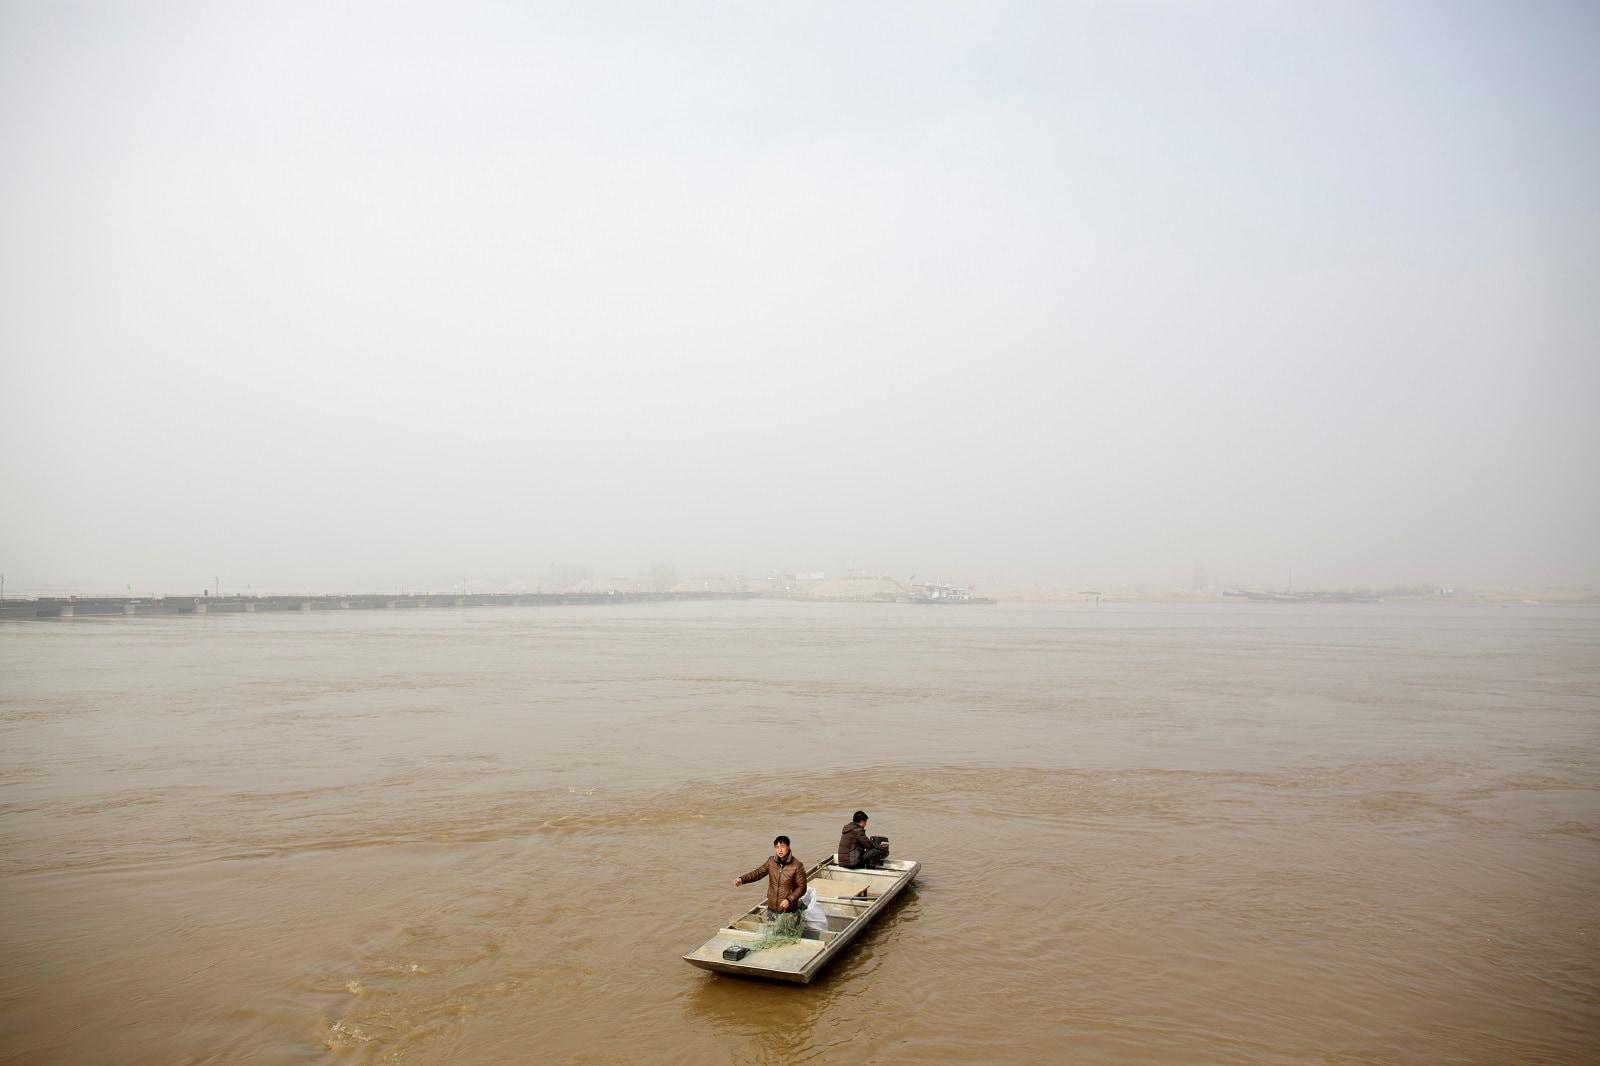 Fishermen Sun Lianxi, 32, and Sun Genxi, 44, travel down the Yellow River to cast their net on the northern outskirts of Zhengzhou, Henan province, China, February 21, 2019. REUTERS/Thomas Peter